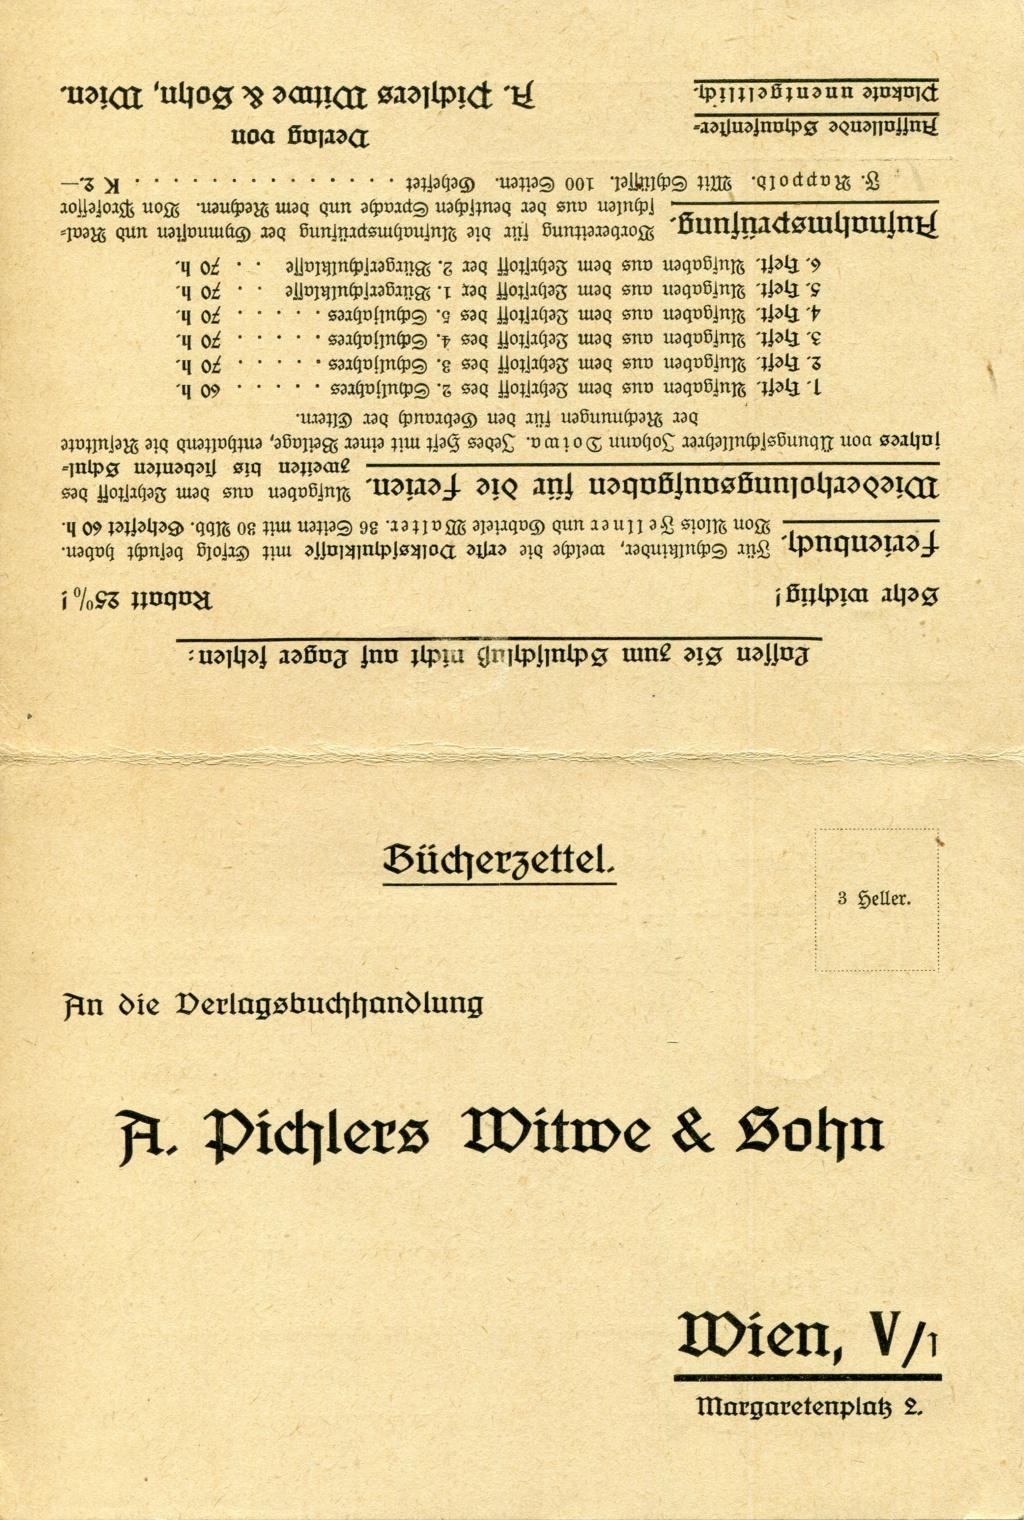 Privatganzsachen von A. Pichlers Witwe & Sohn - Seite 2 Pcihle34